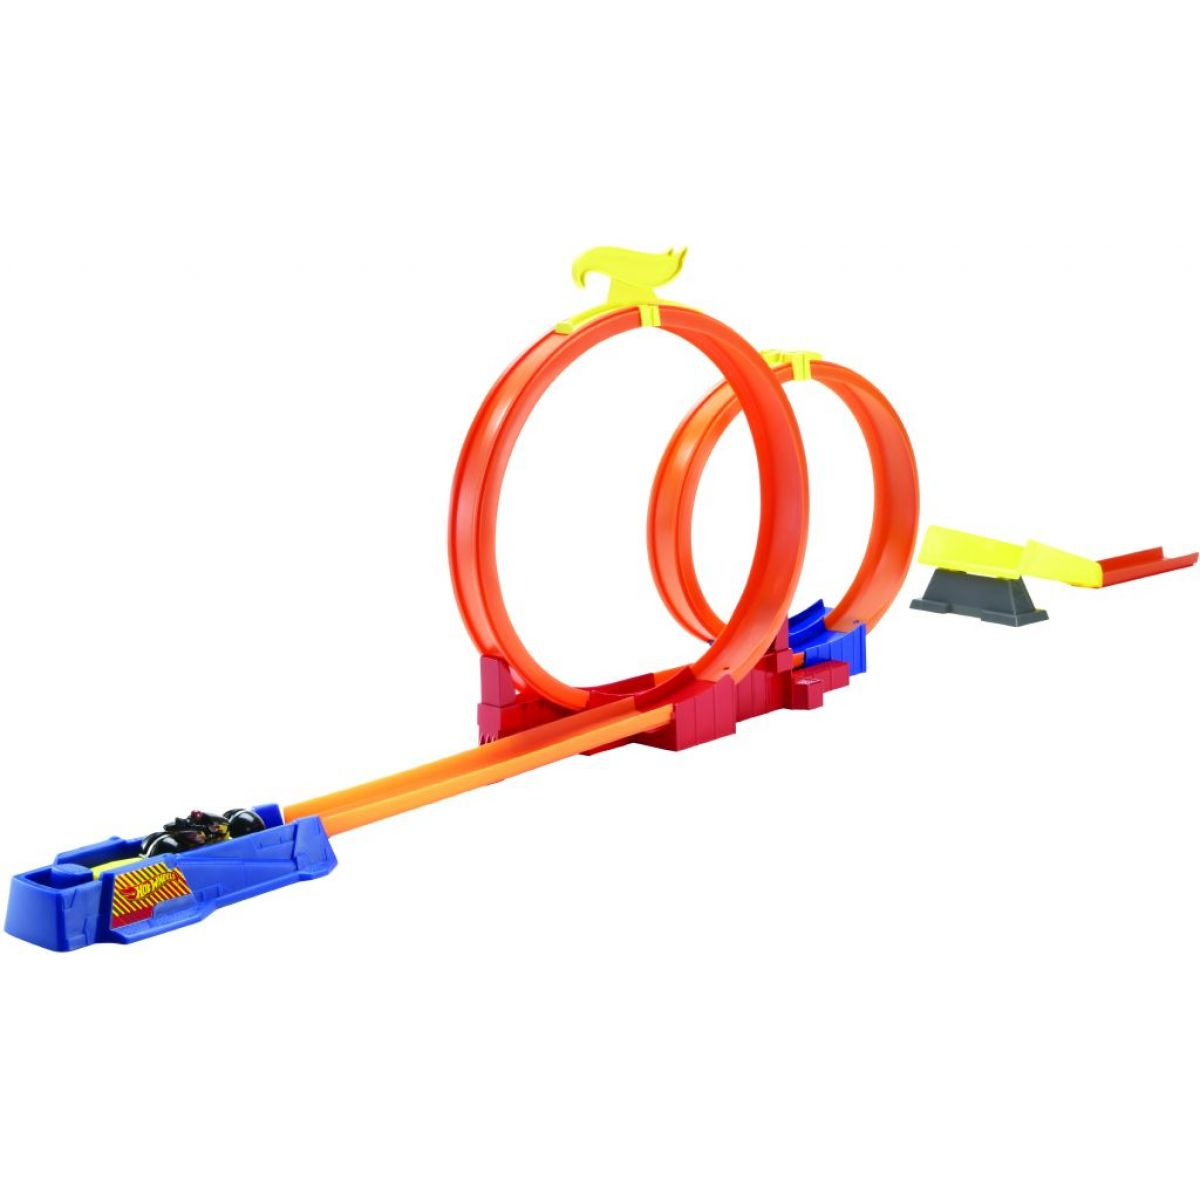 Hot Wheels Supermotorka profi dráha - Double Loop